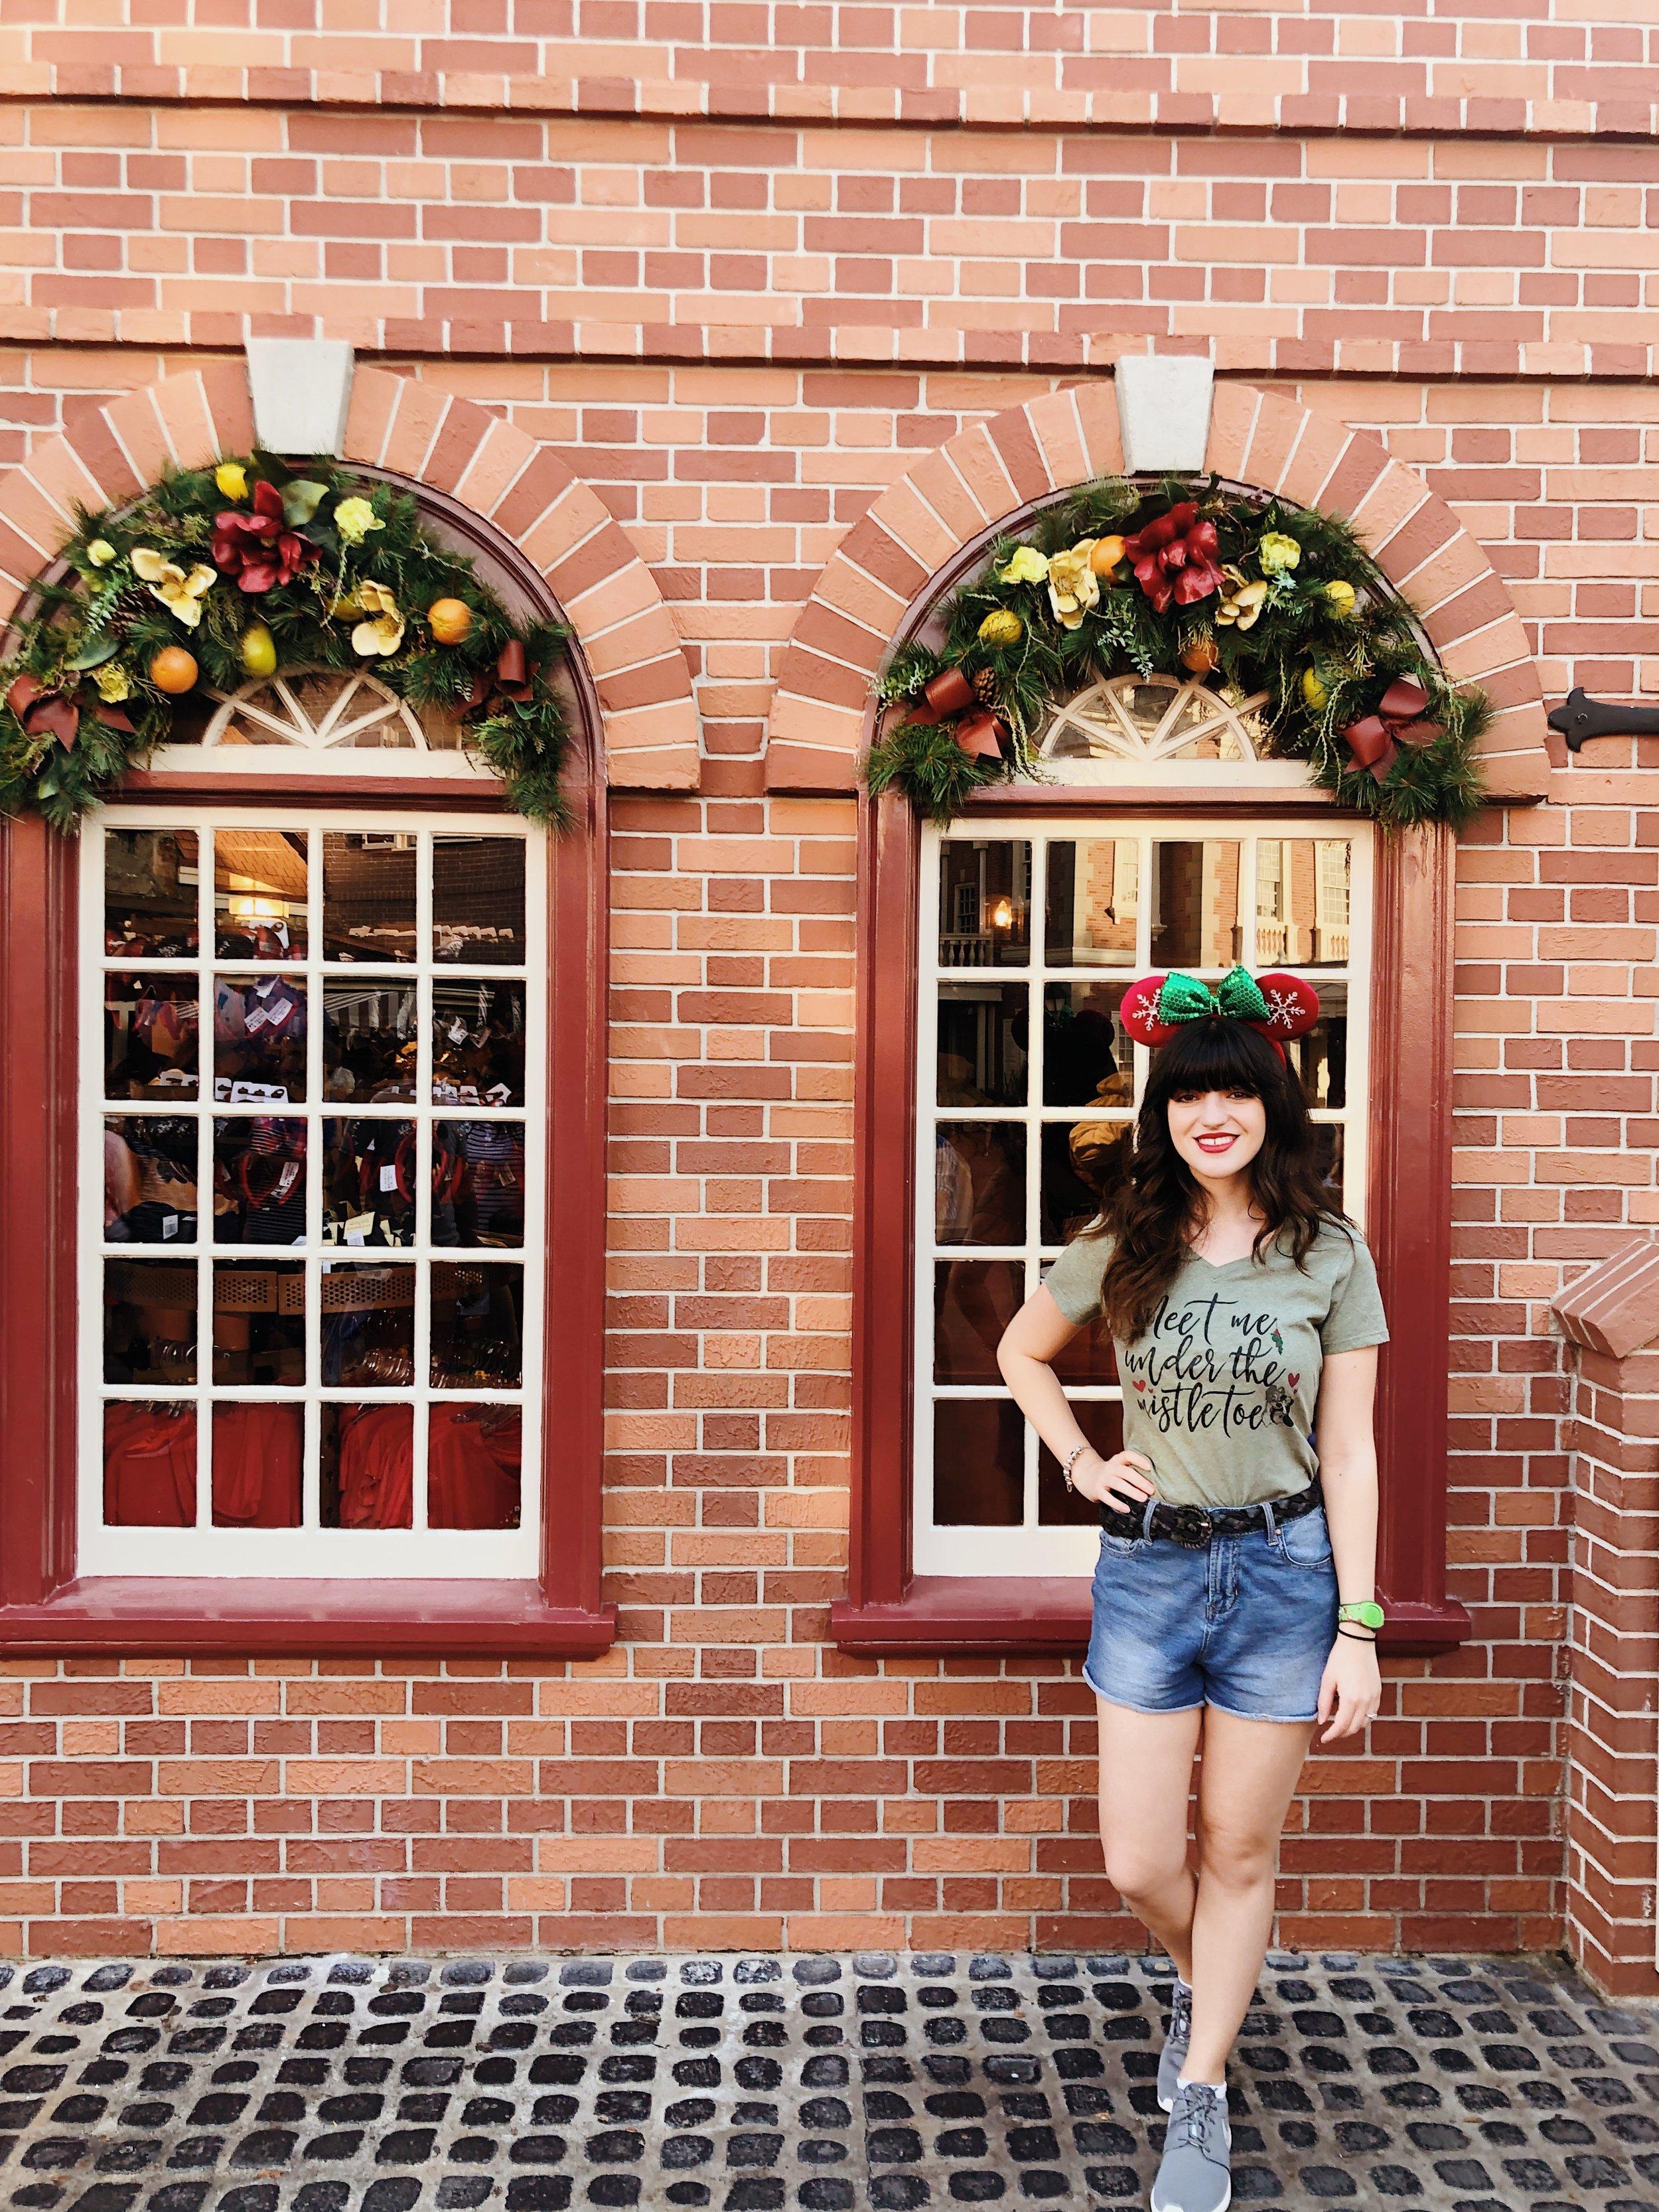 """meet me under the mistletoe"" shirt - shopdisney (old); christmas ears -  shopdisney"